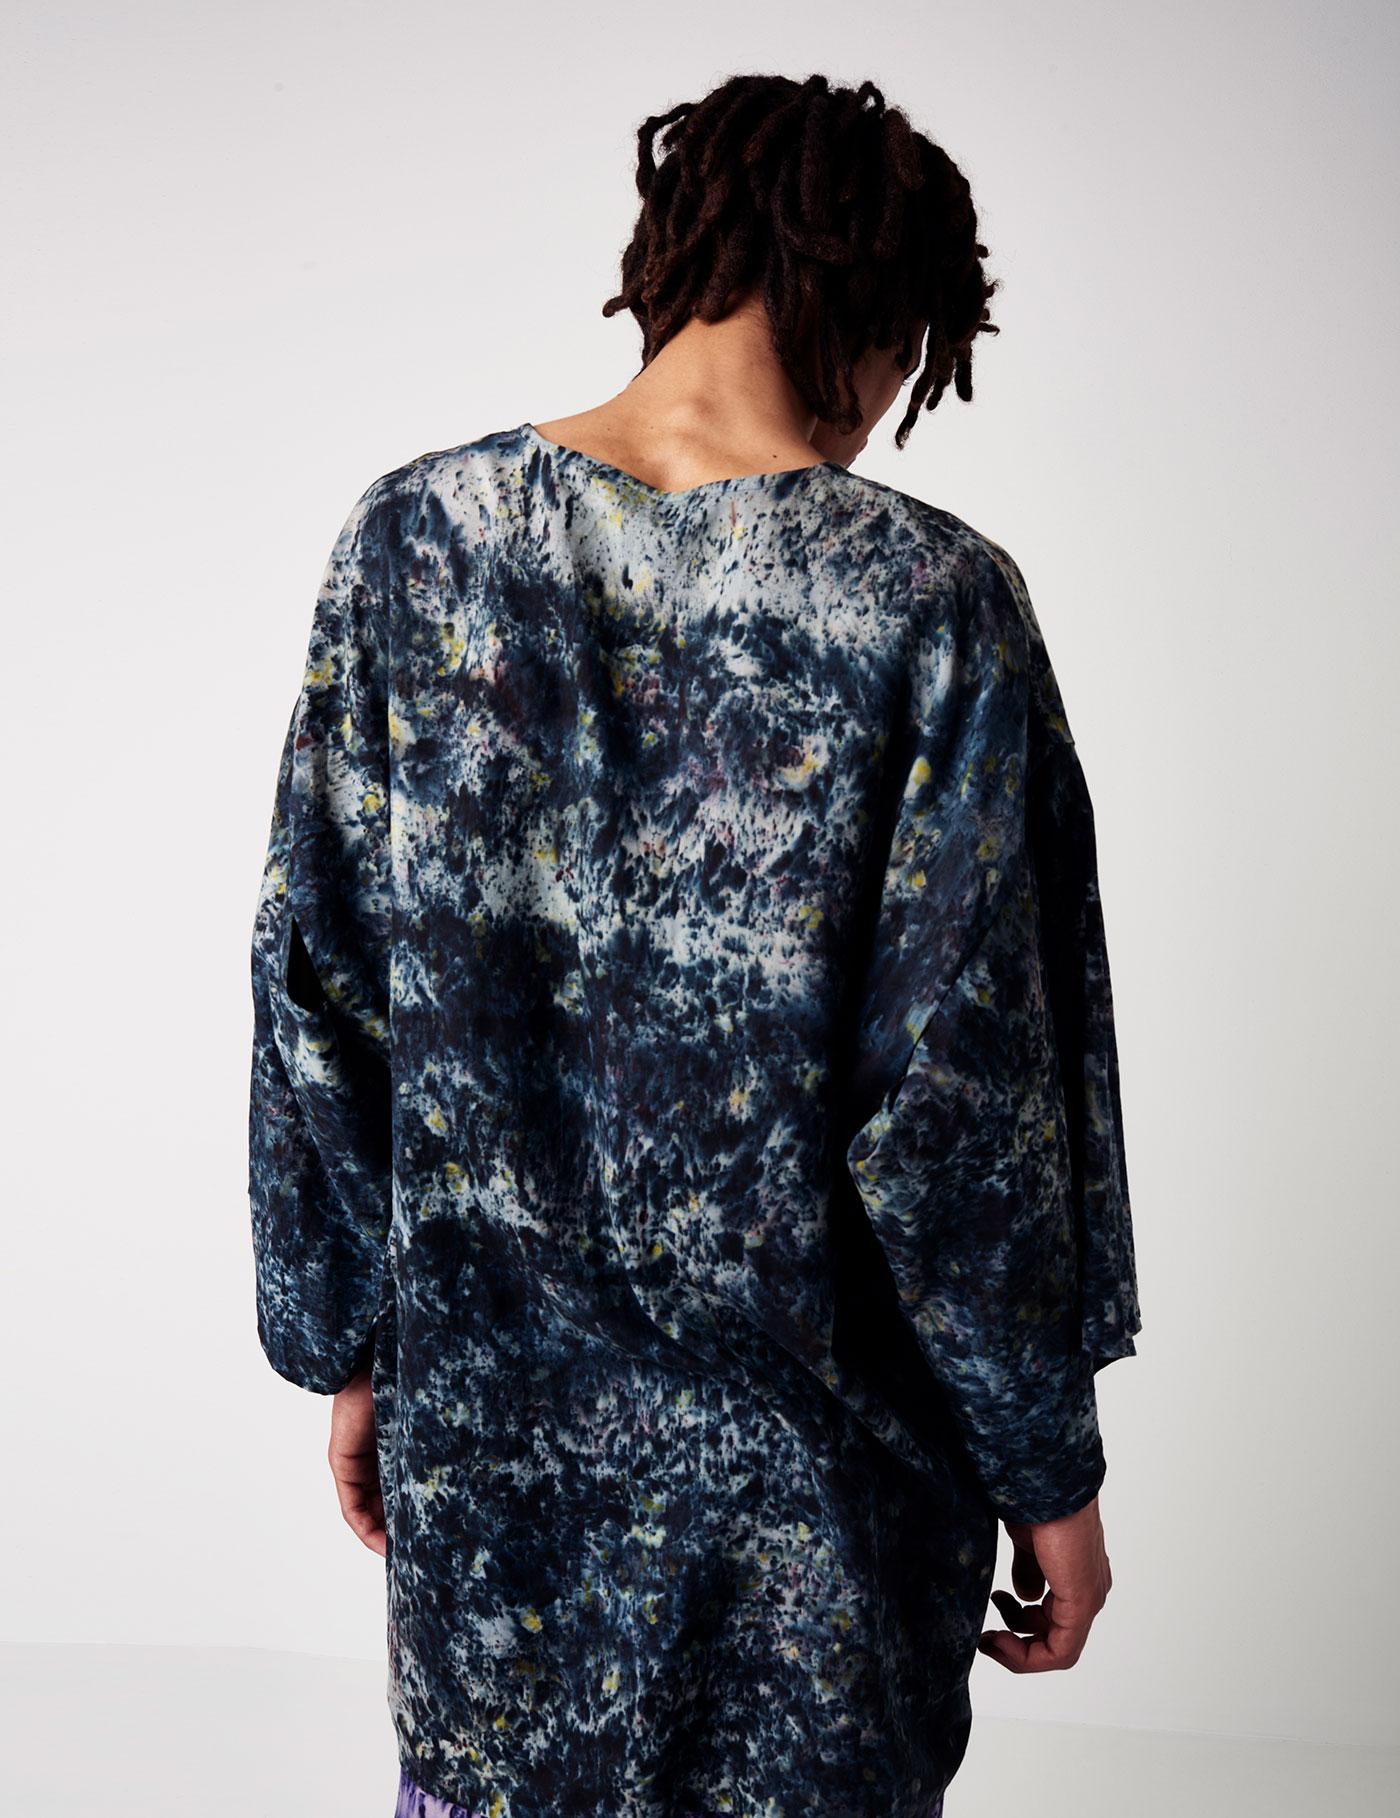 Hemp and organic silk eco printed kimono t shirt silvia for Sustainable t shirt printing